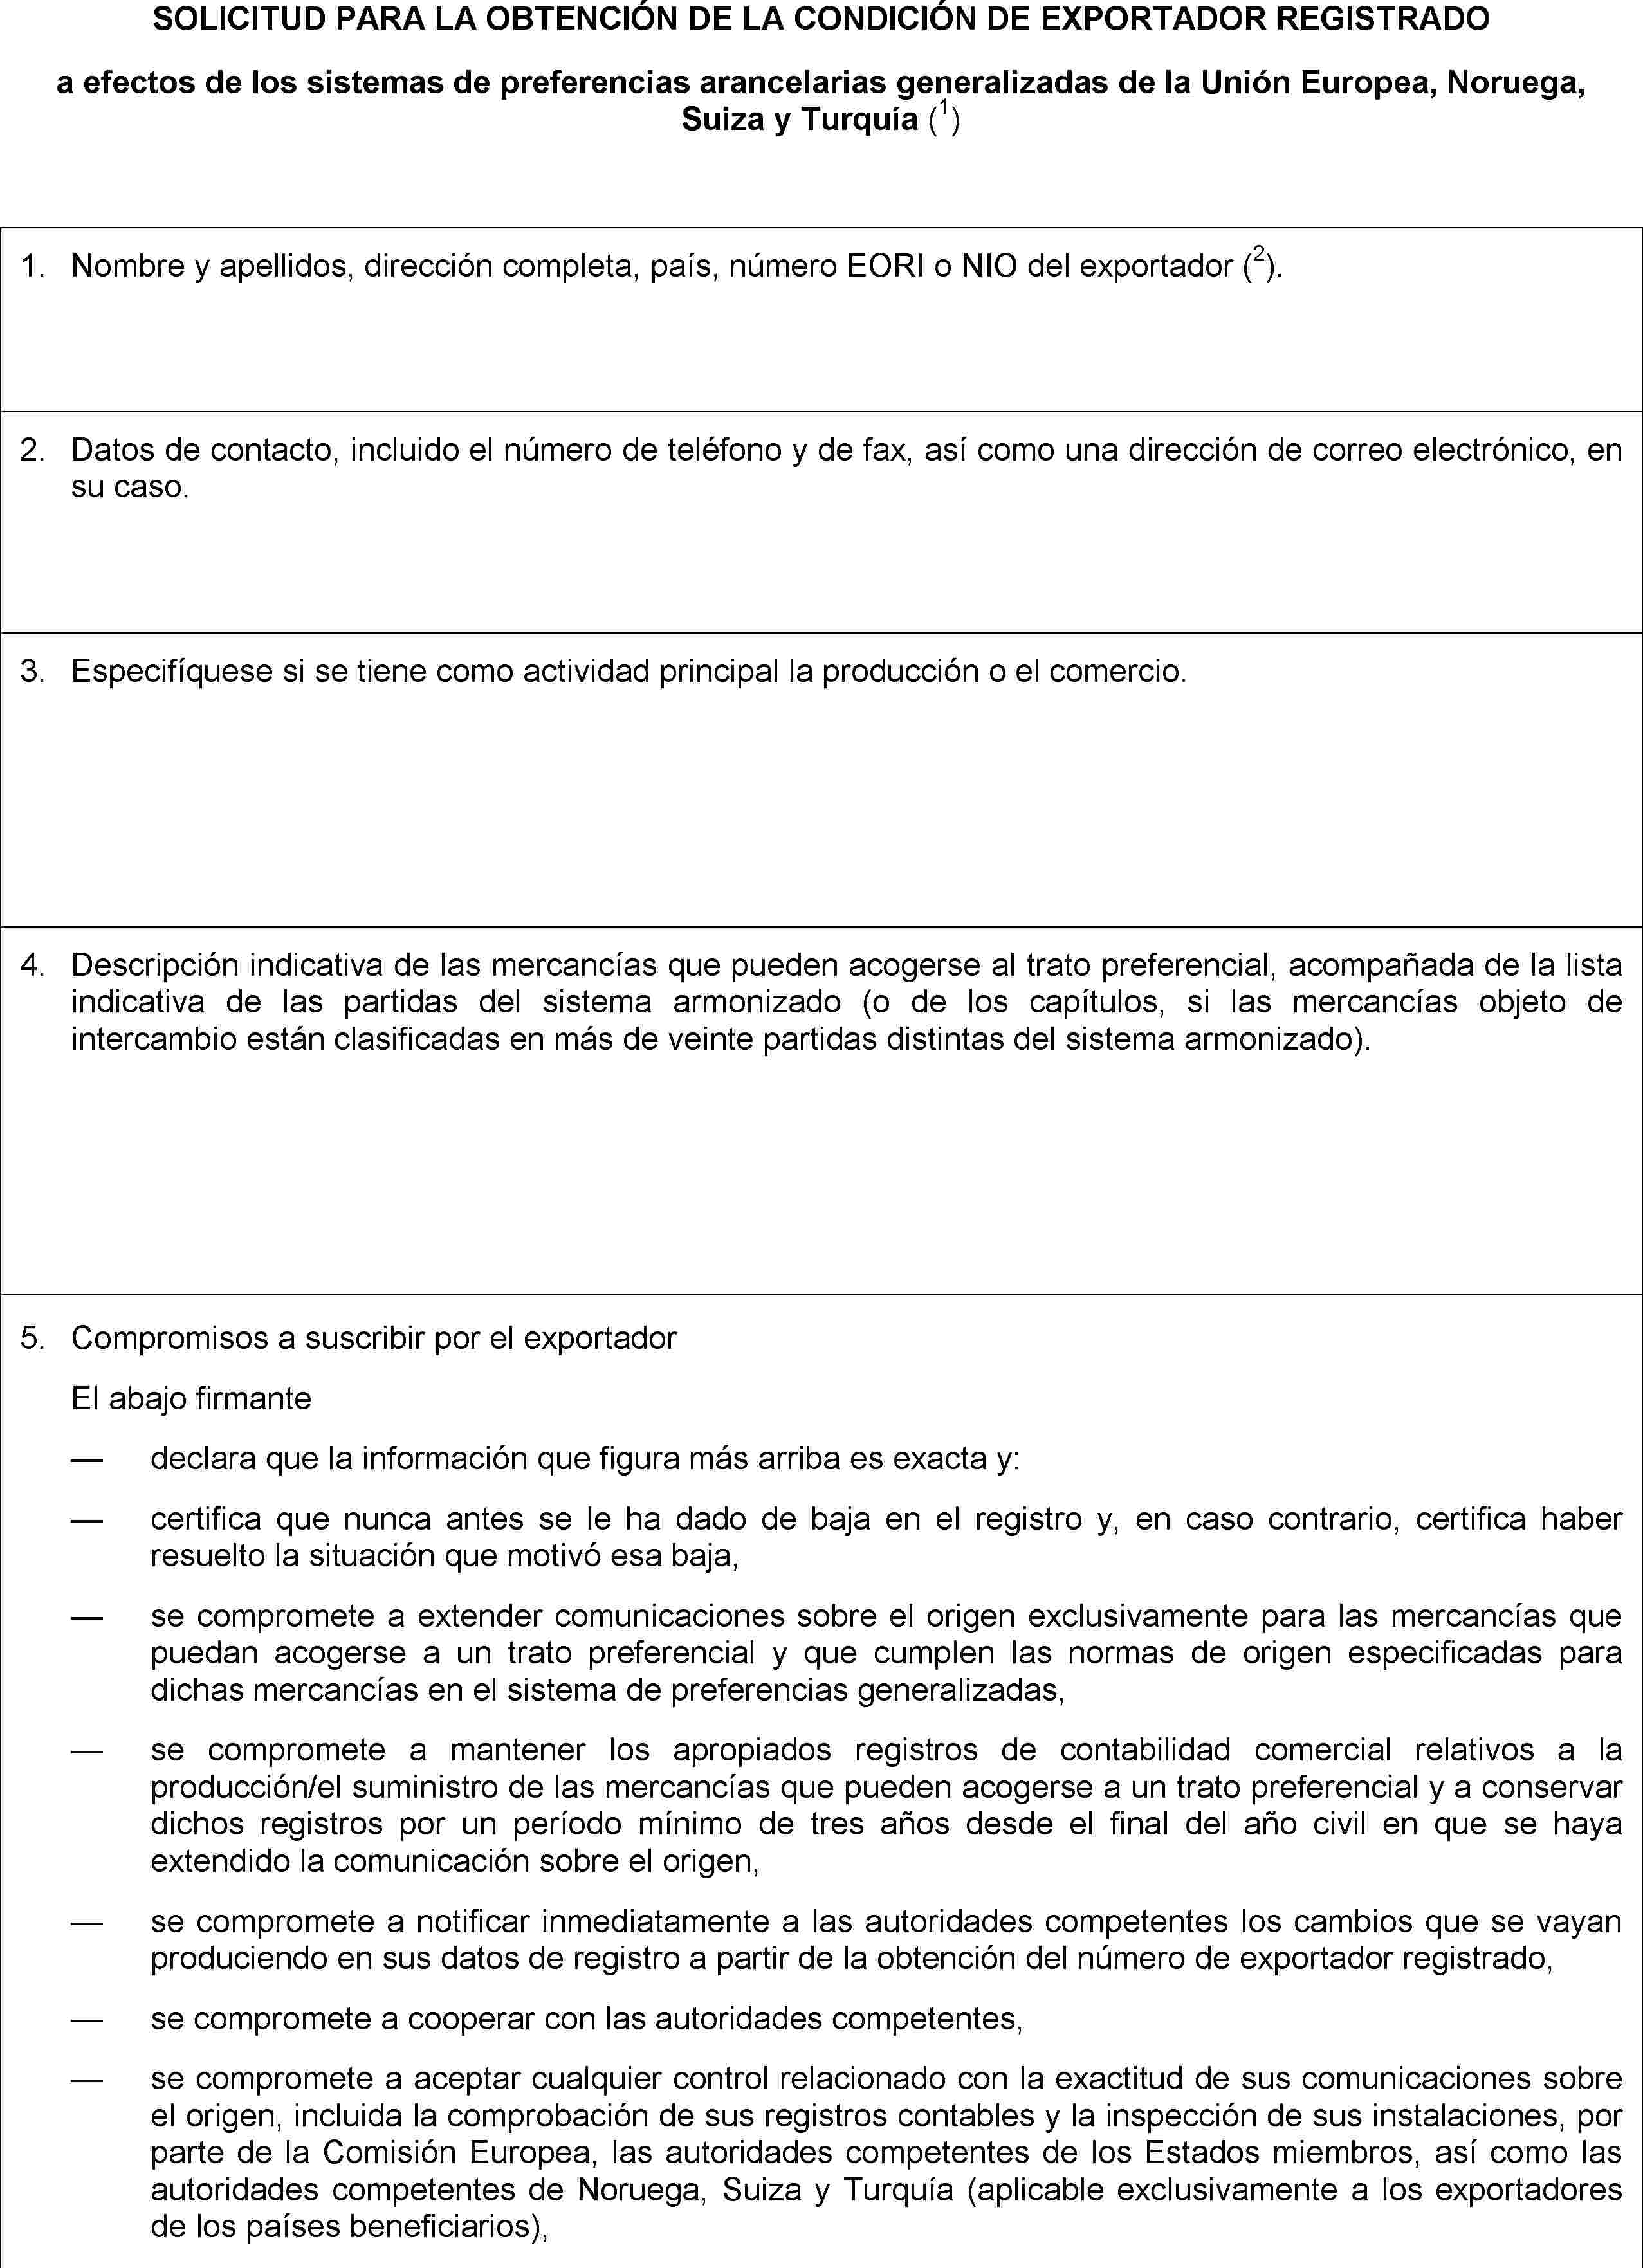 EUR-Lex - 01993R2454-20151208 - EN - EUR-Lex